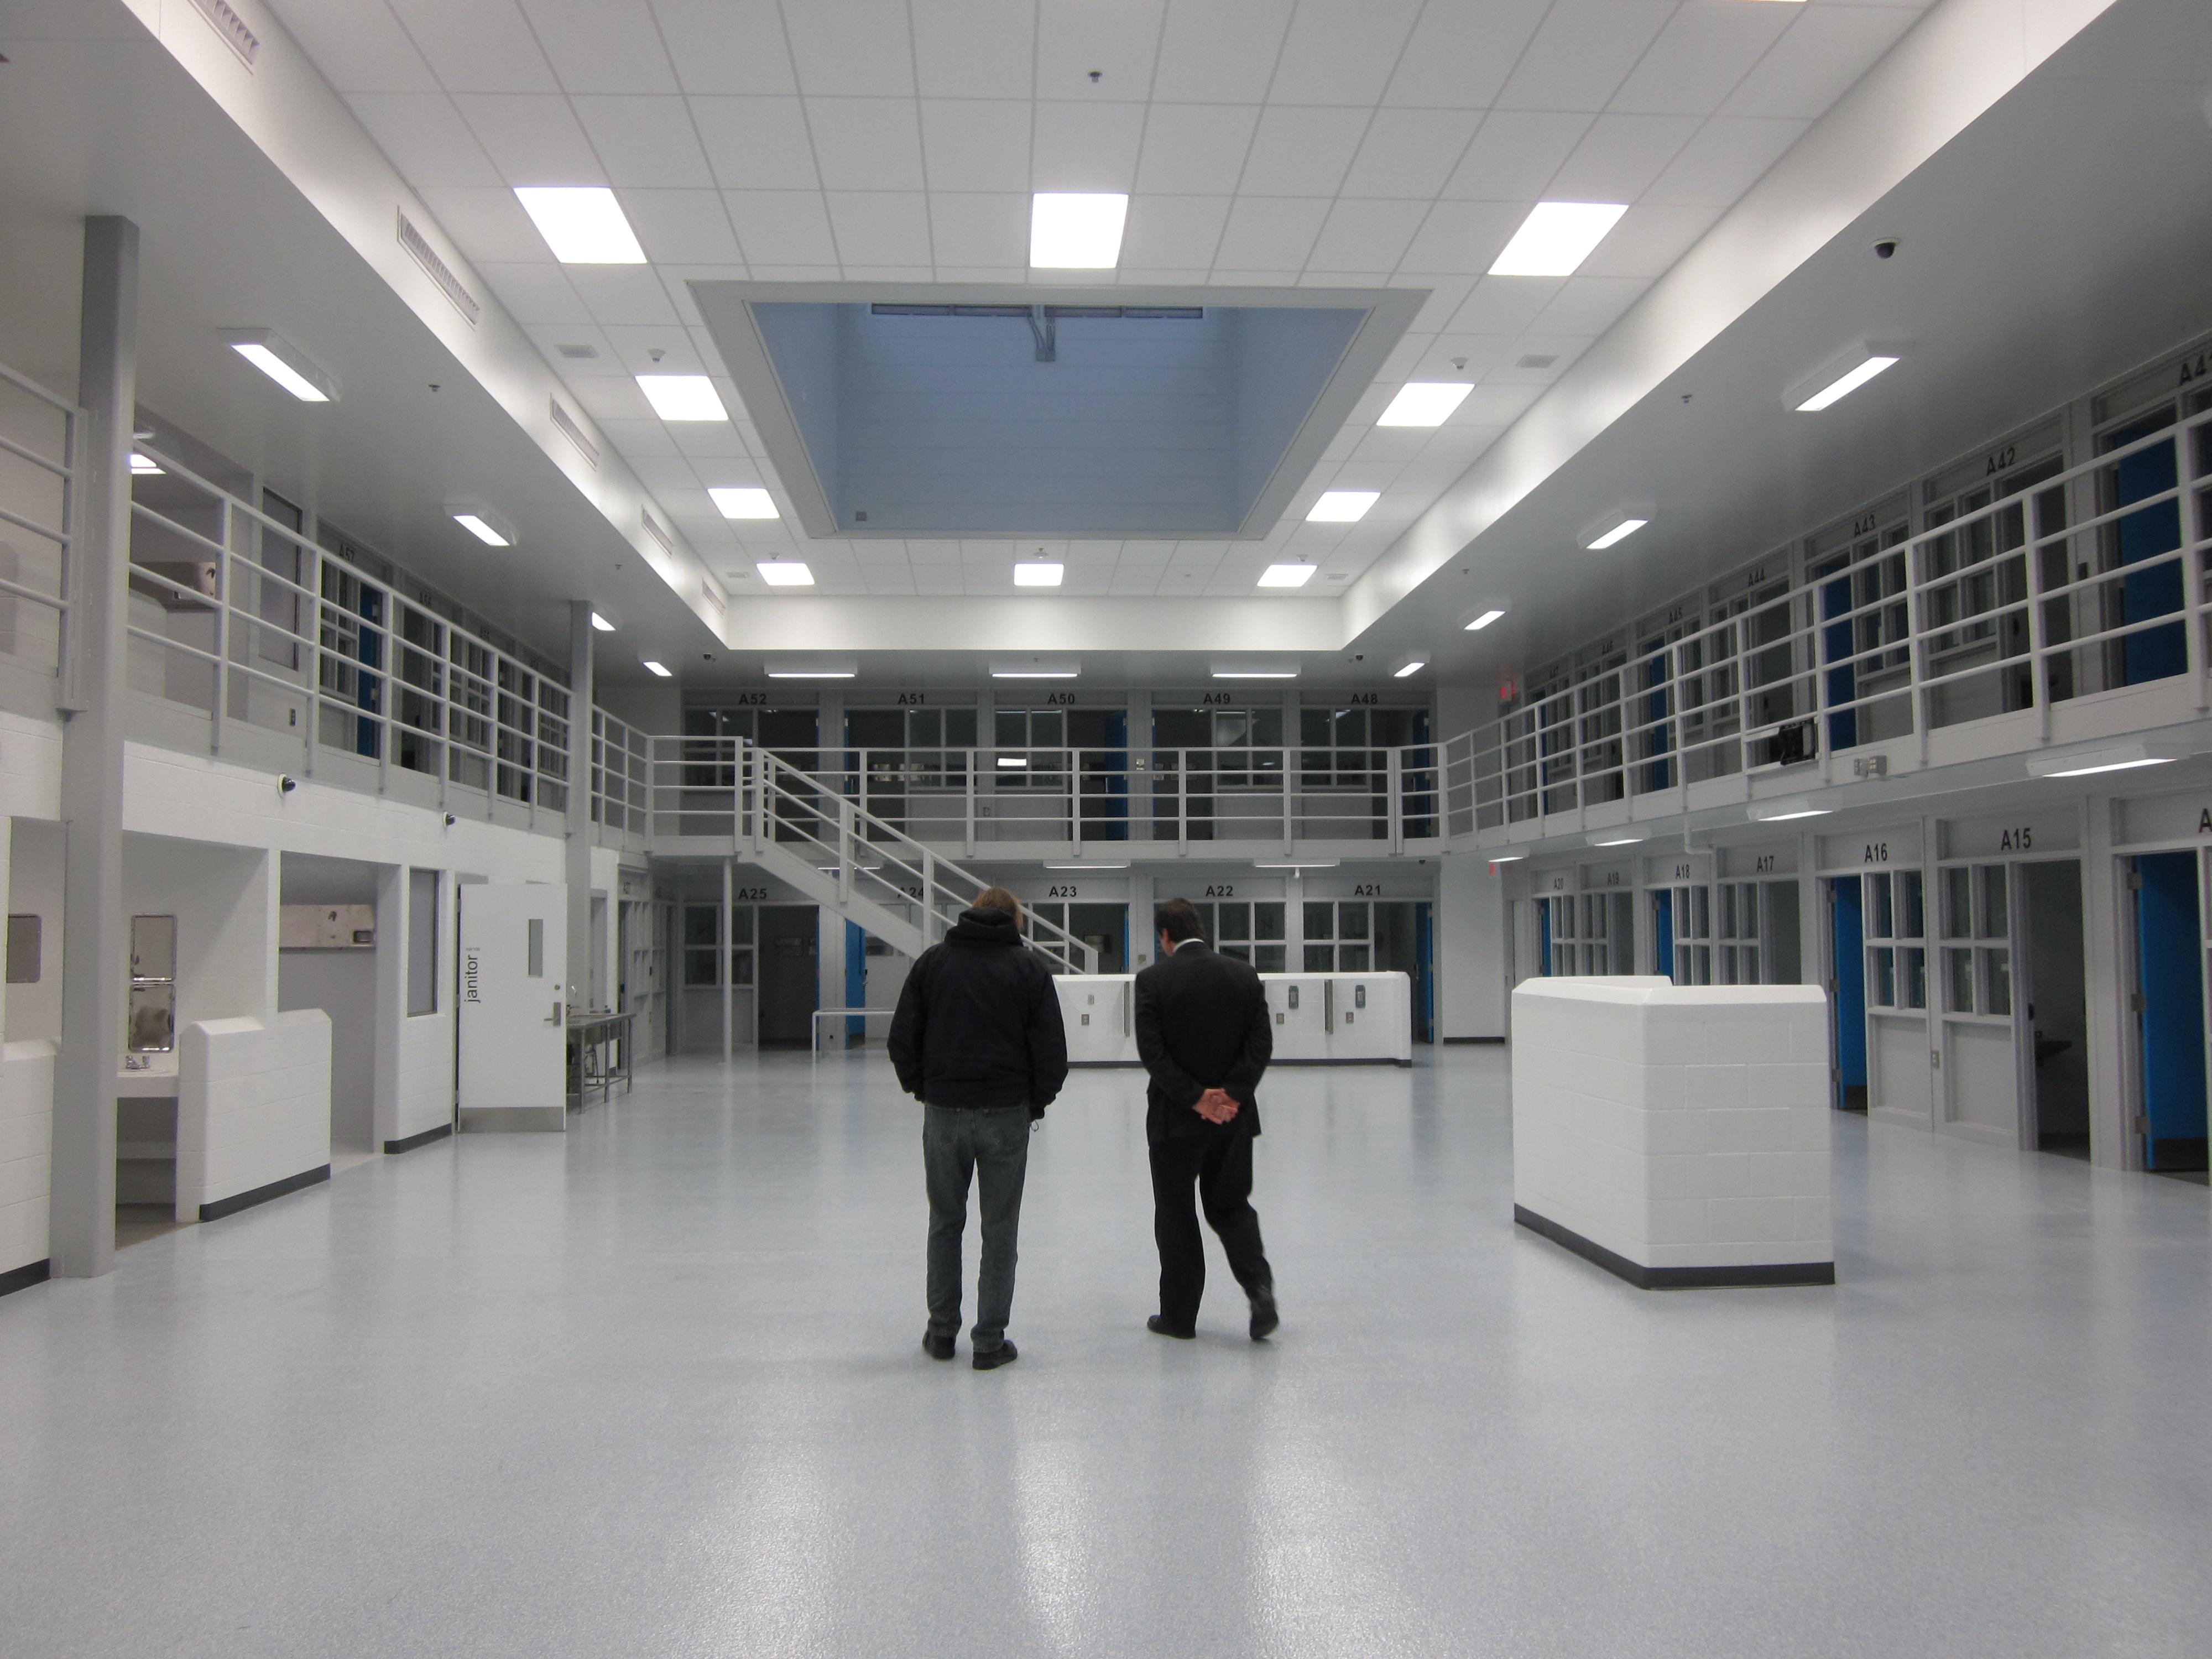 Goose Creek Correctional Prison